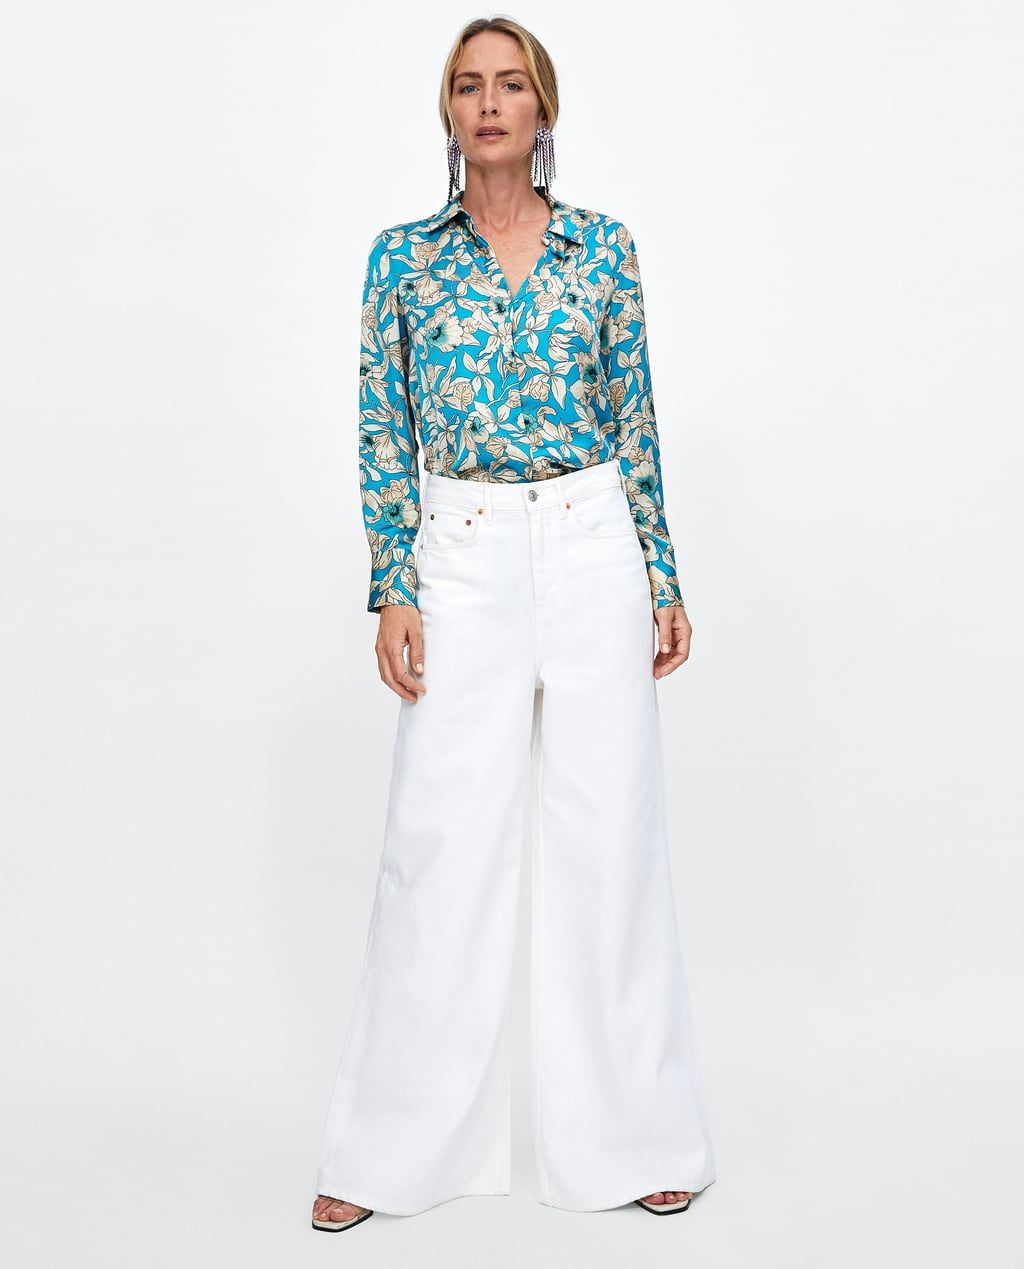 Camisa Satinada Estampado Floral Fashion Floral Print Shirt Clothes